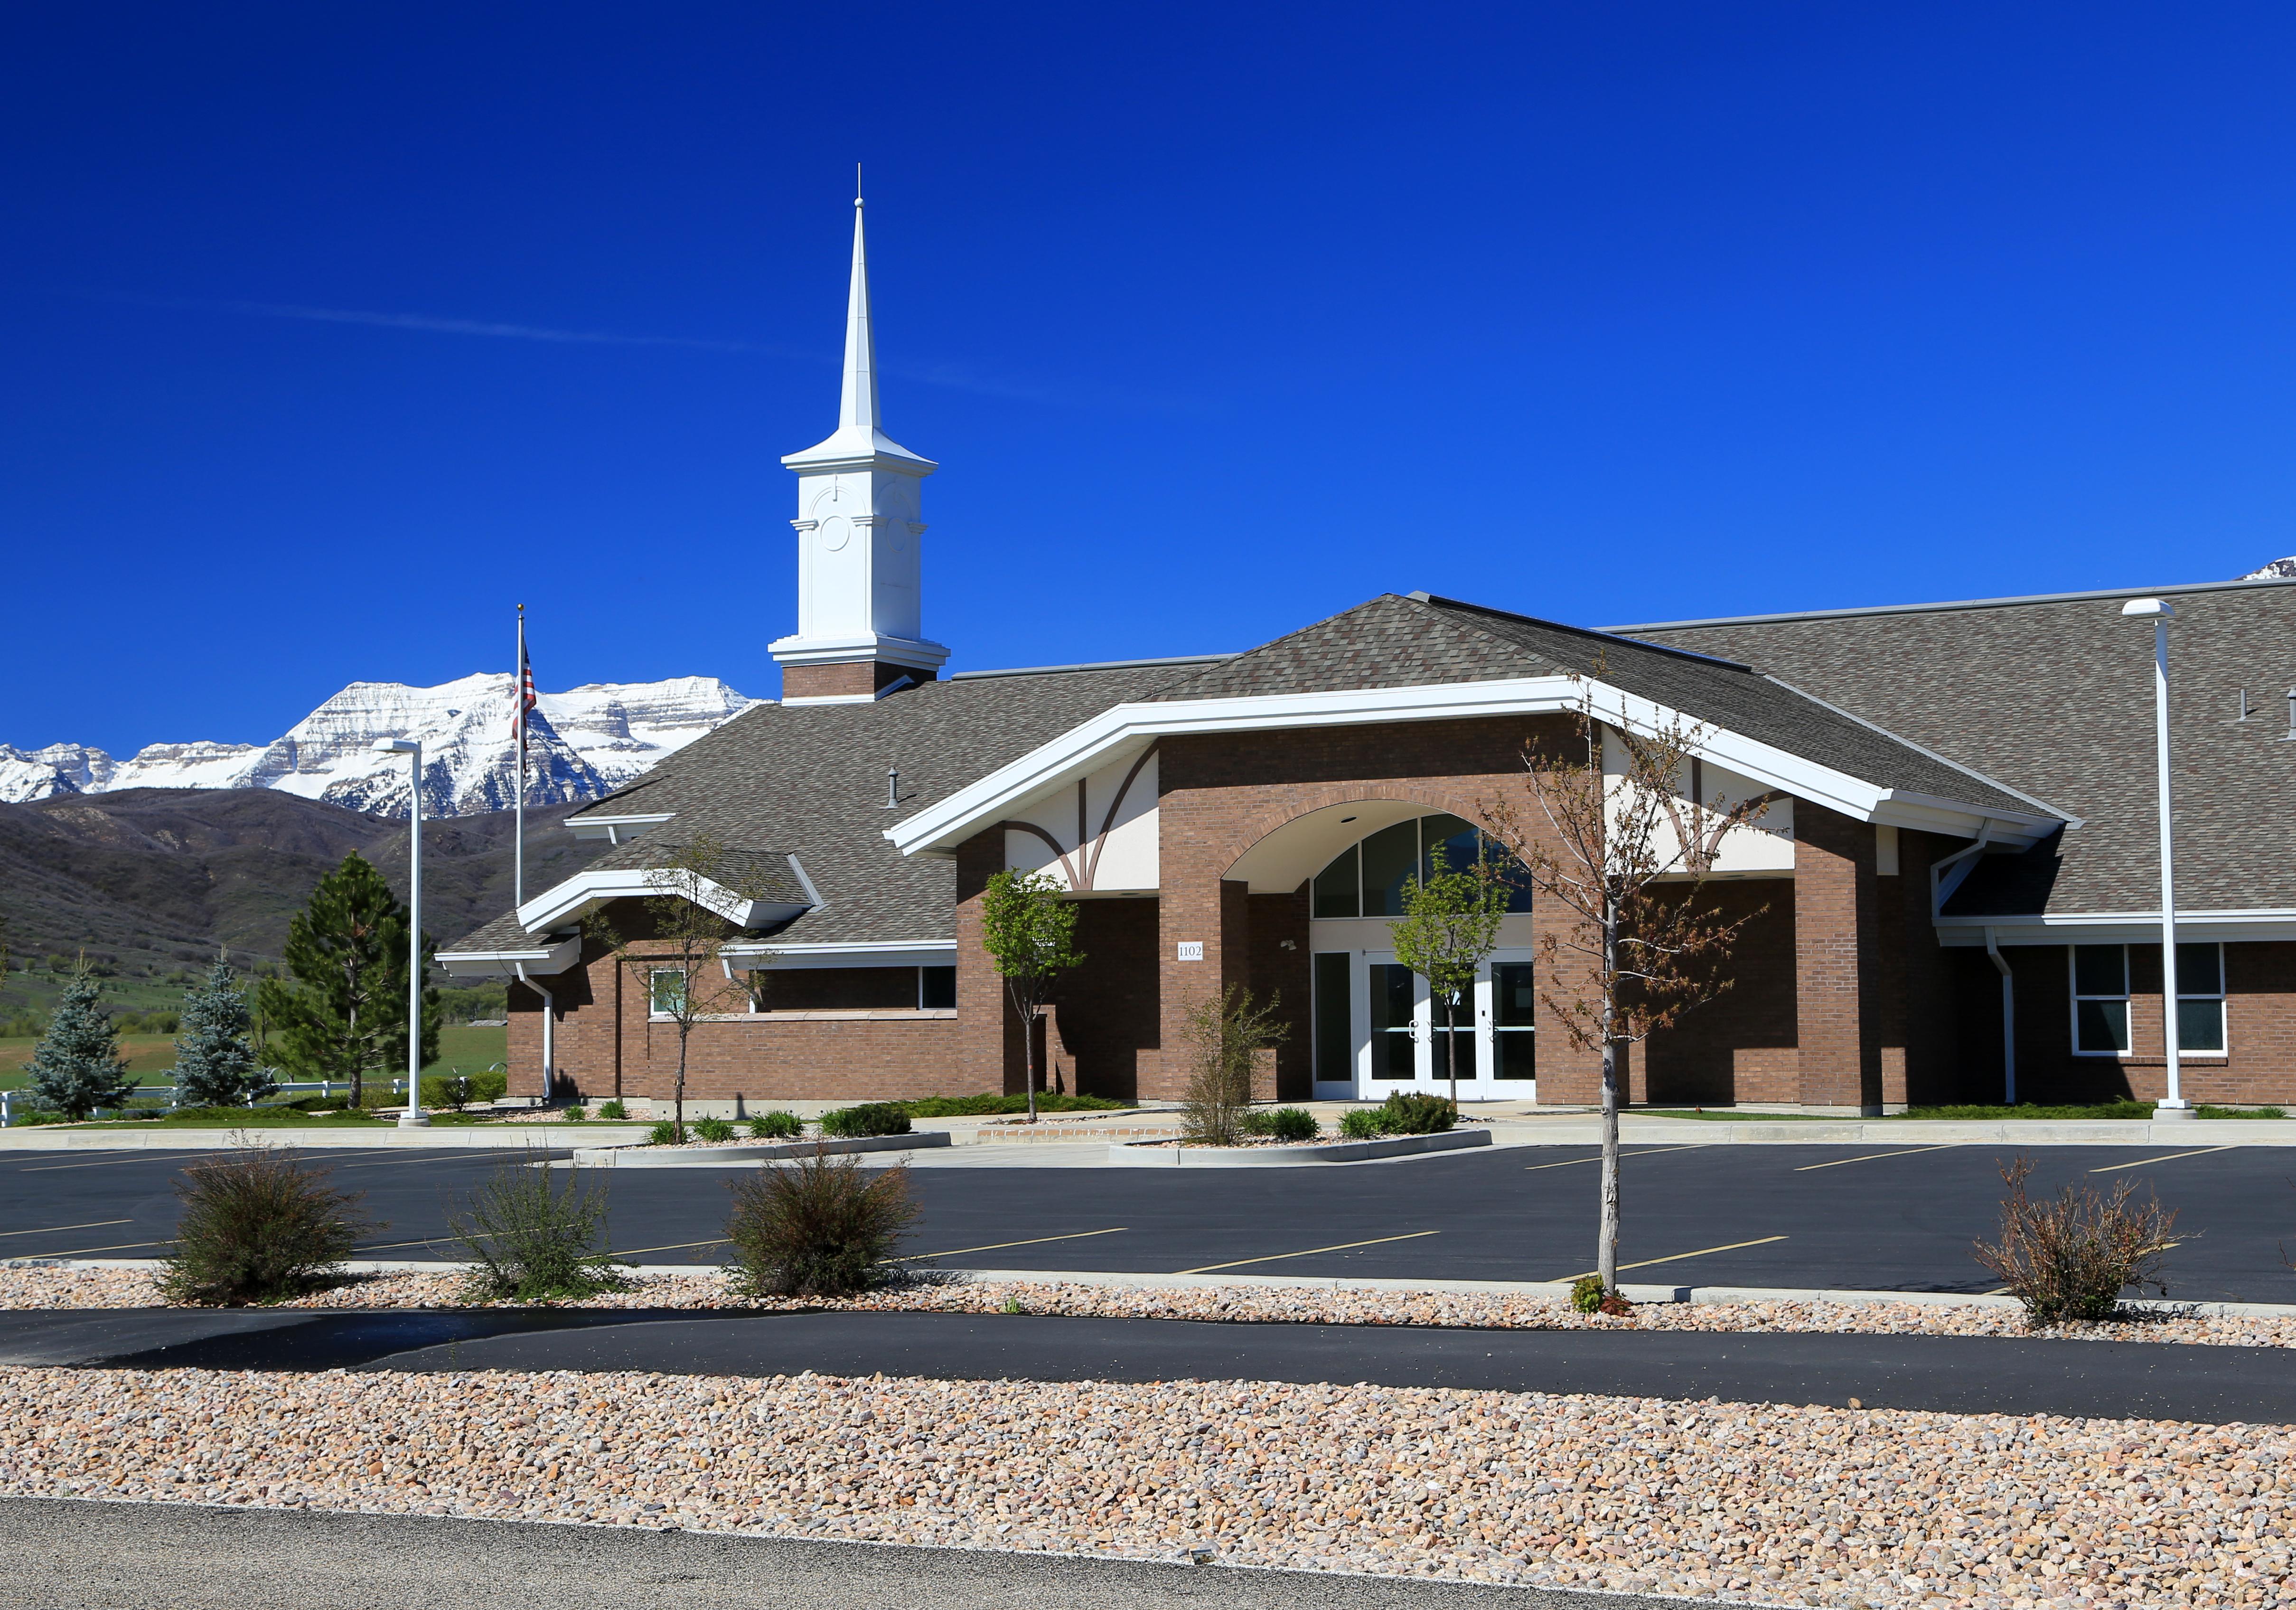 Church Parking Lot (Shutterstock/Johnny Adolphson)